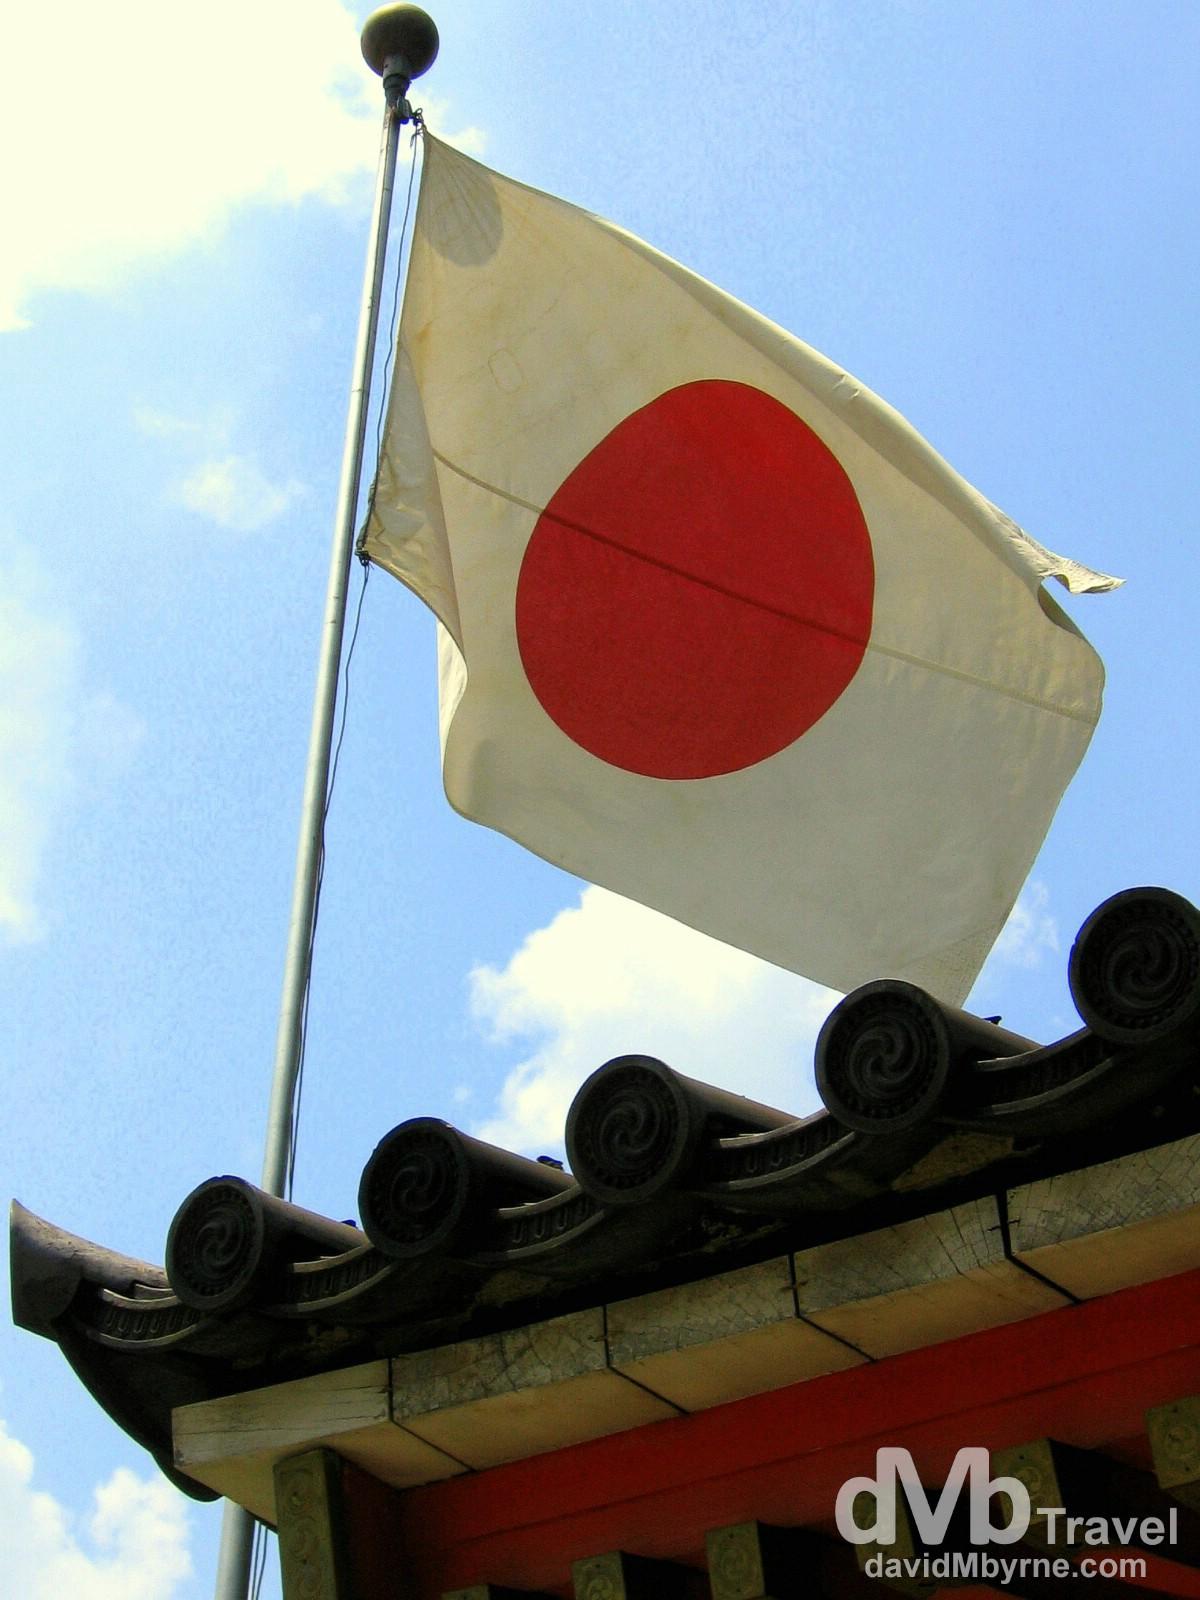 The Japanese flag flies over the entrance to the Yasaka Jinja Shrine in Kyoto, Honshu, Japan. July 18th, 2005.